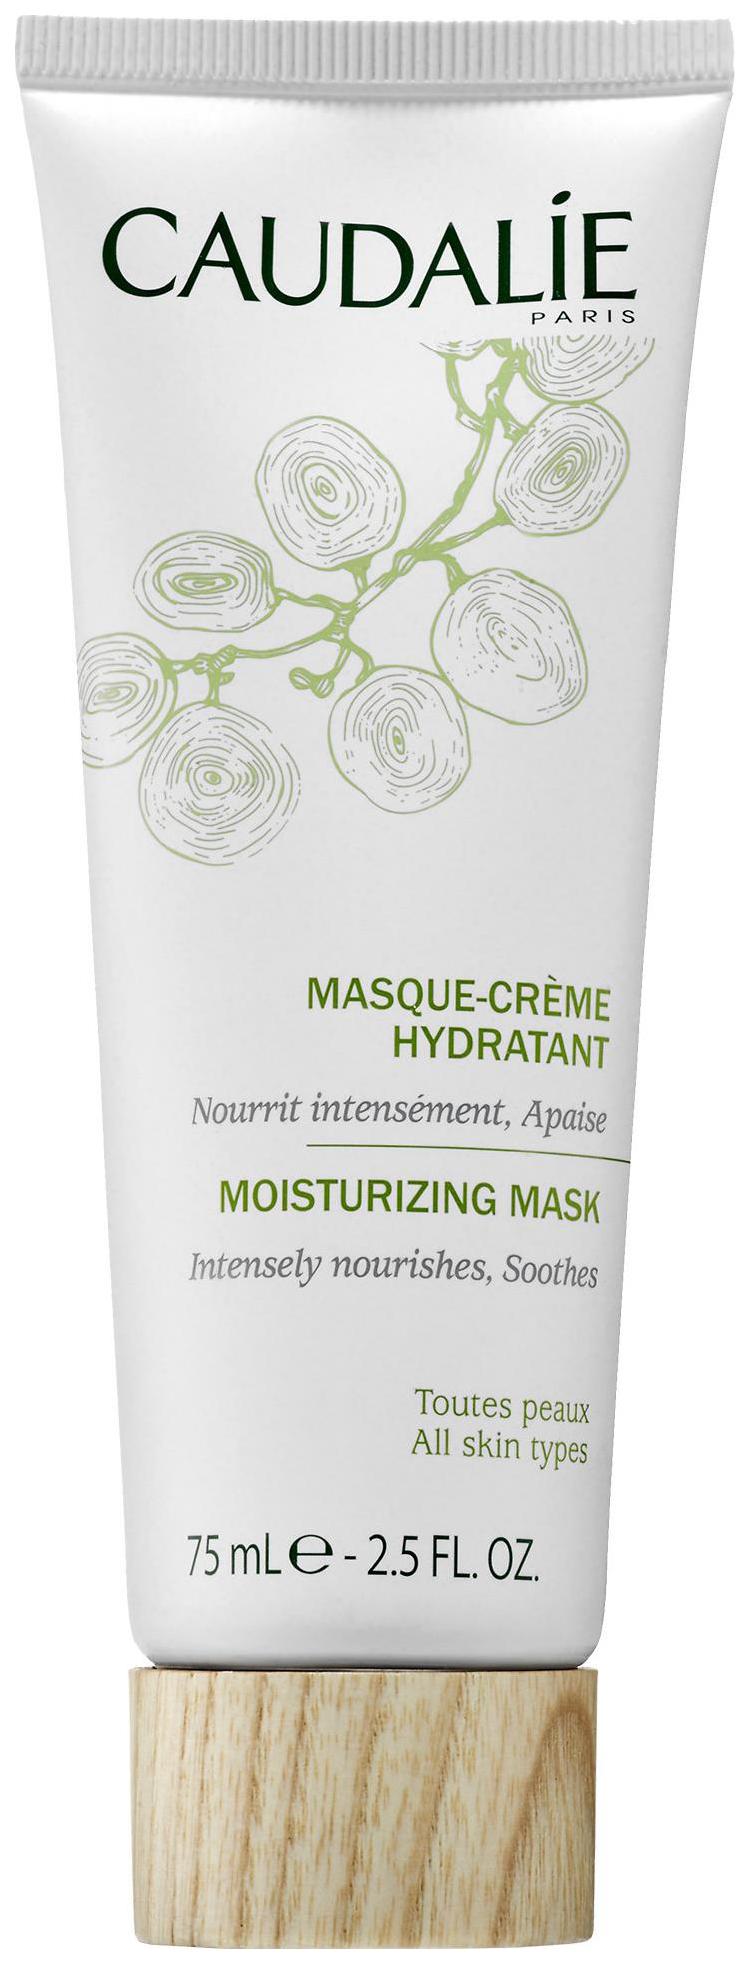 Маска для лица Caudalie Masque-Crème Hydratant 75 мл